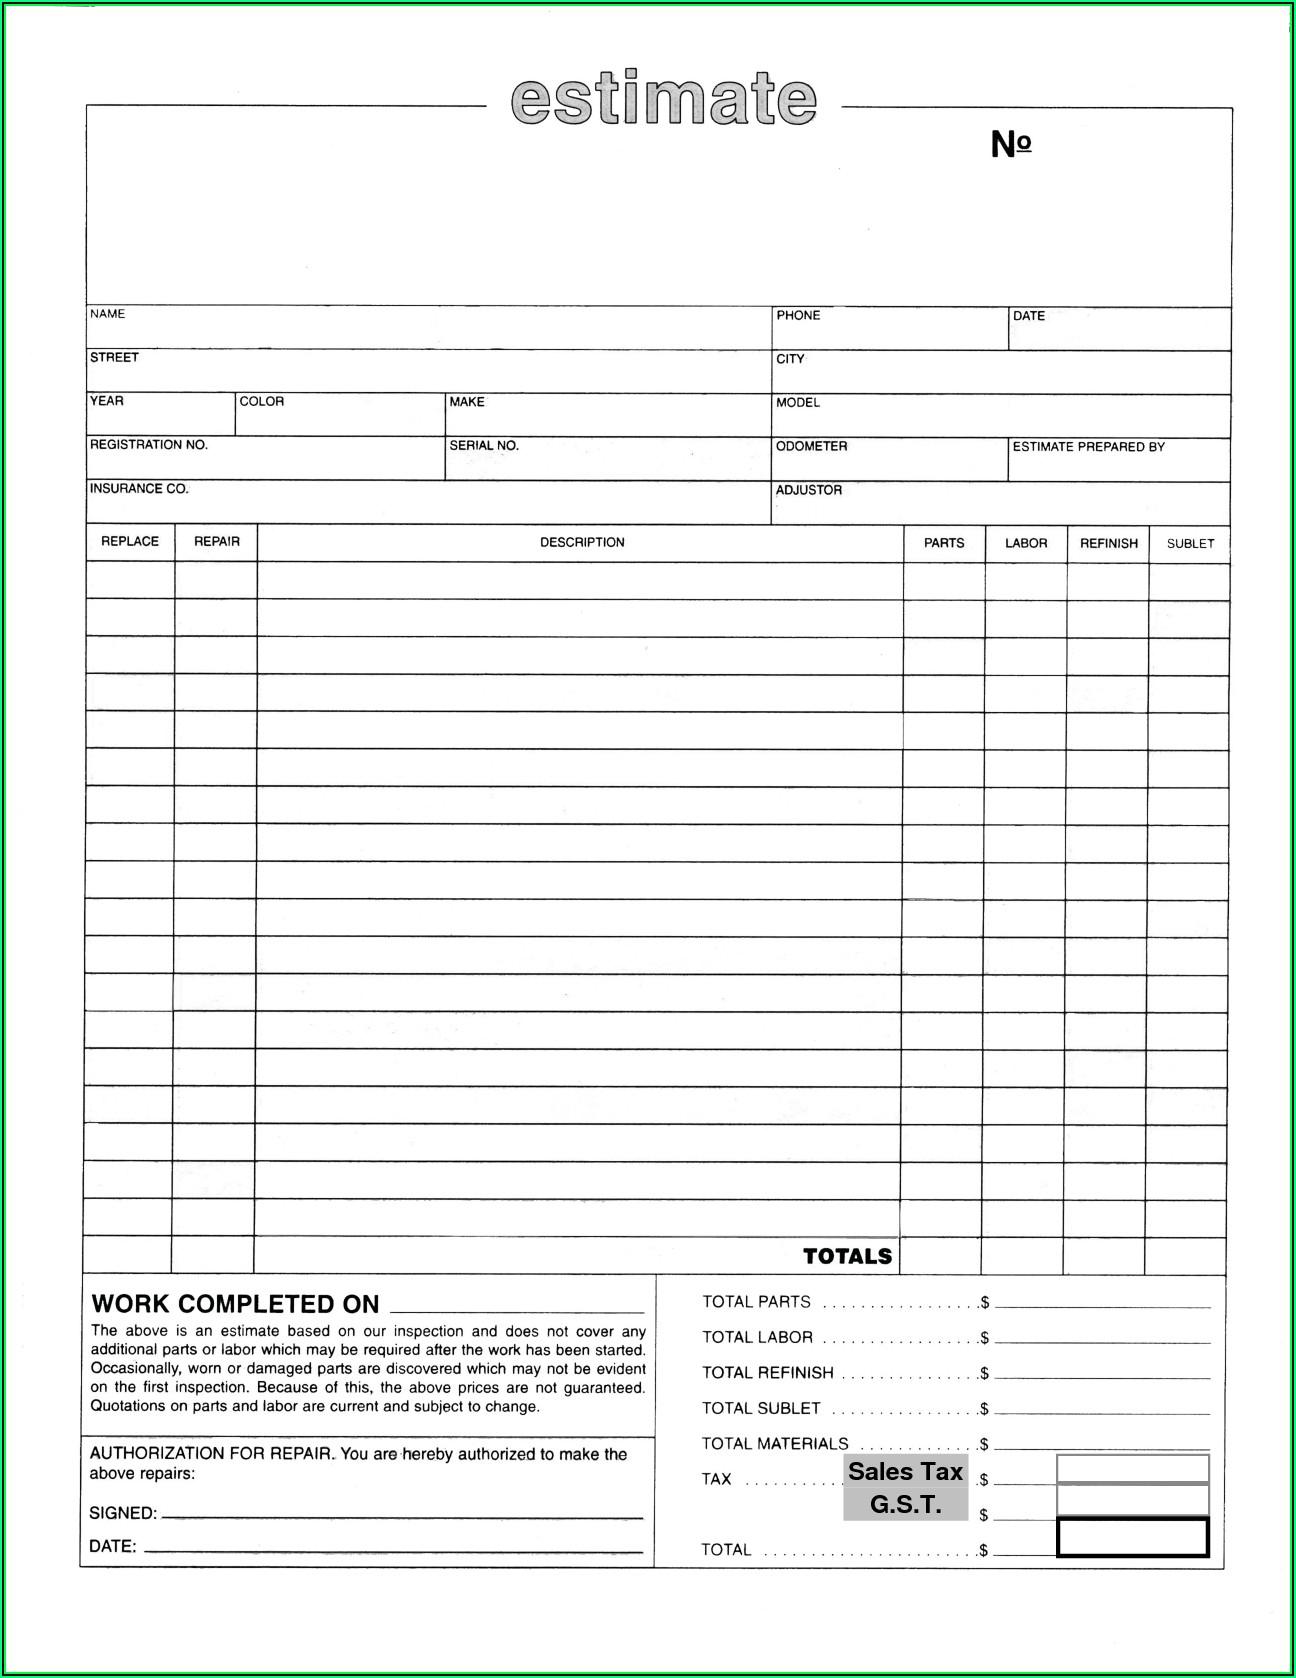 Vehicle Repair Estimate Form